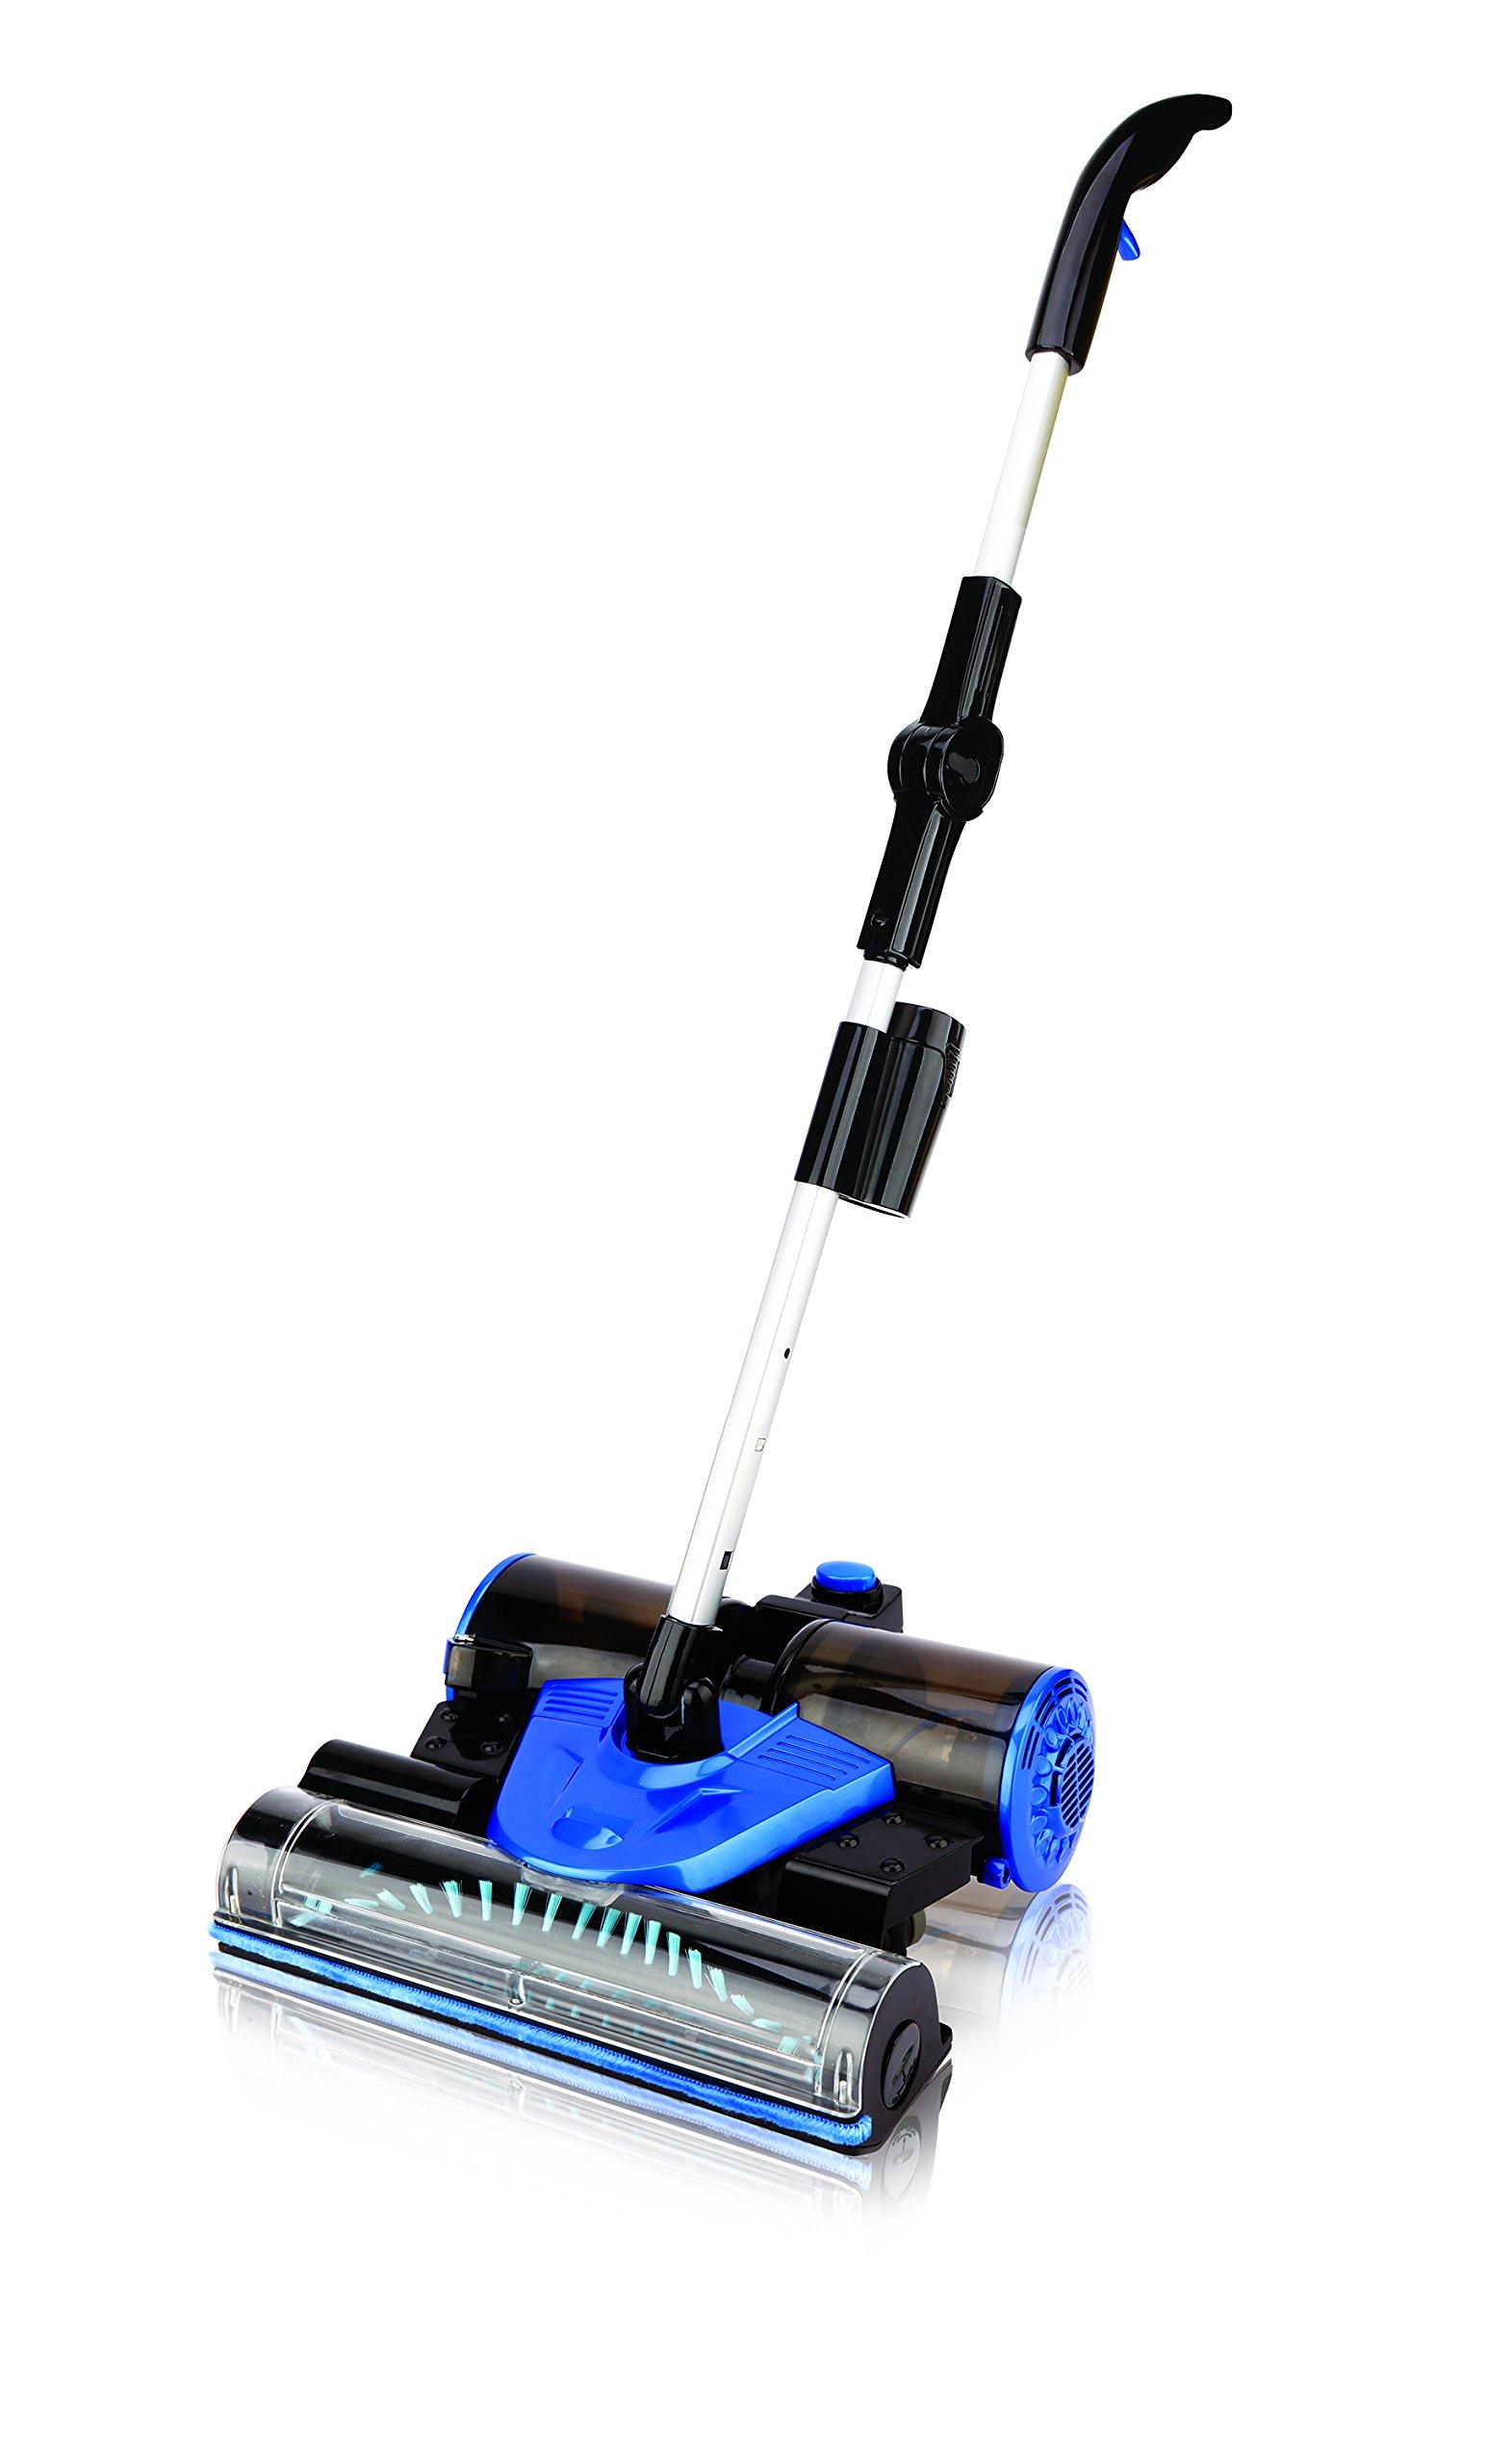 360 Degree Spinner Vac Cordless 12V Lithium Ion Lightweight Stick Vacuum